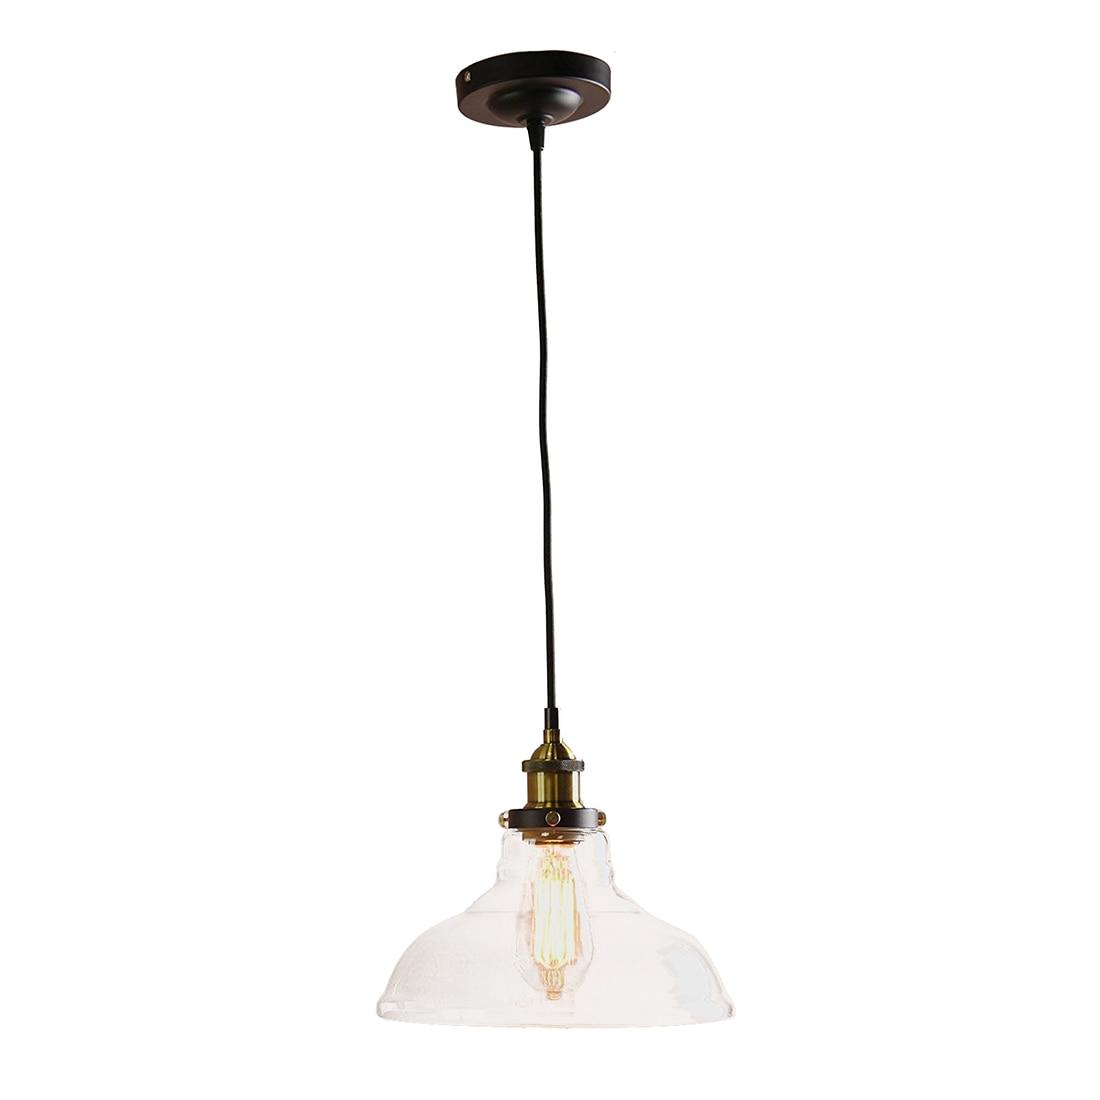 Modern Vintage 1 Light Iron Body Glass Shade Loft Coffee Bar Kitchen cover Chandeliers Hanging Pendant Lamp Light Transparent